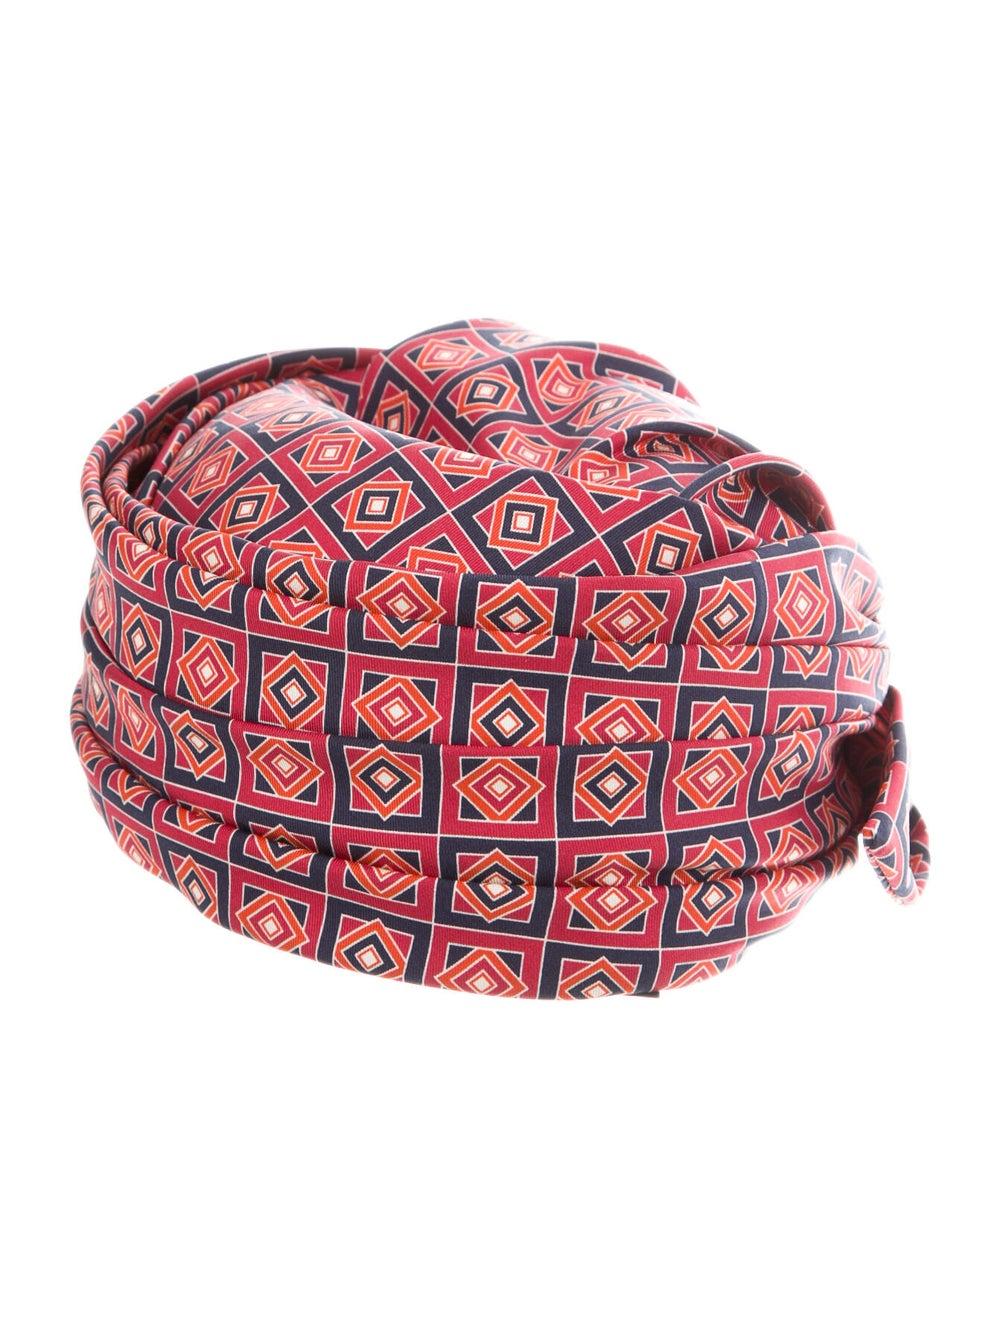 Gucci Printed Silk Turban Red - image 2